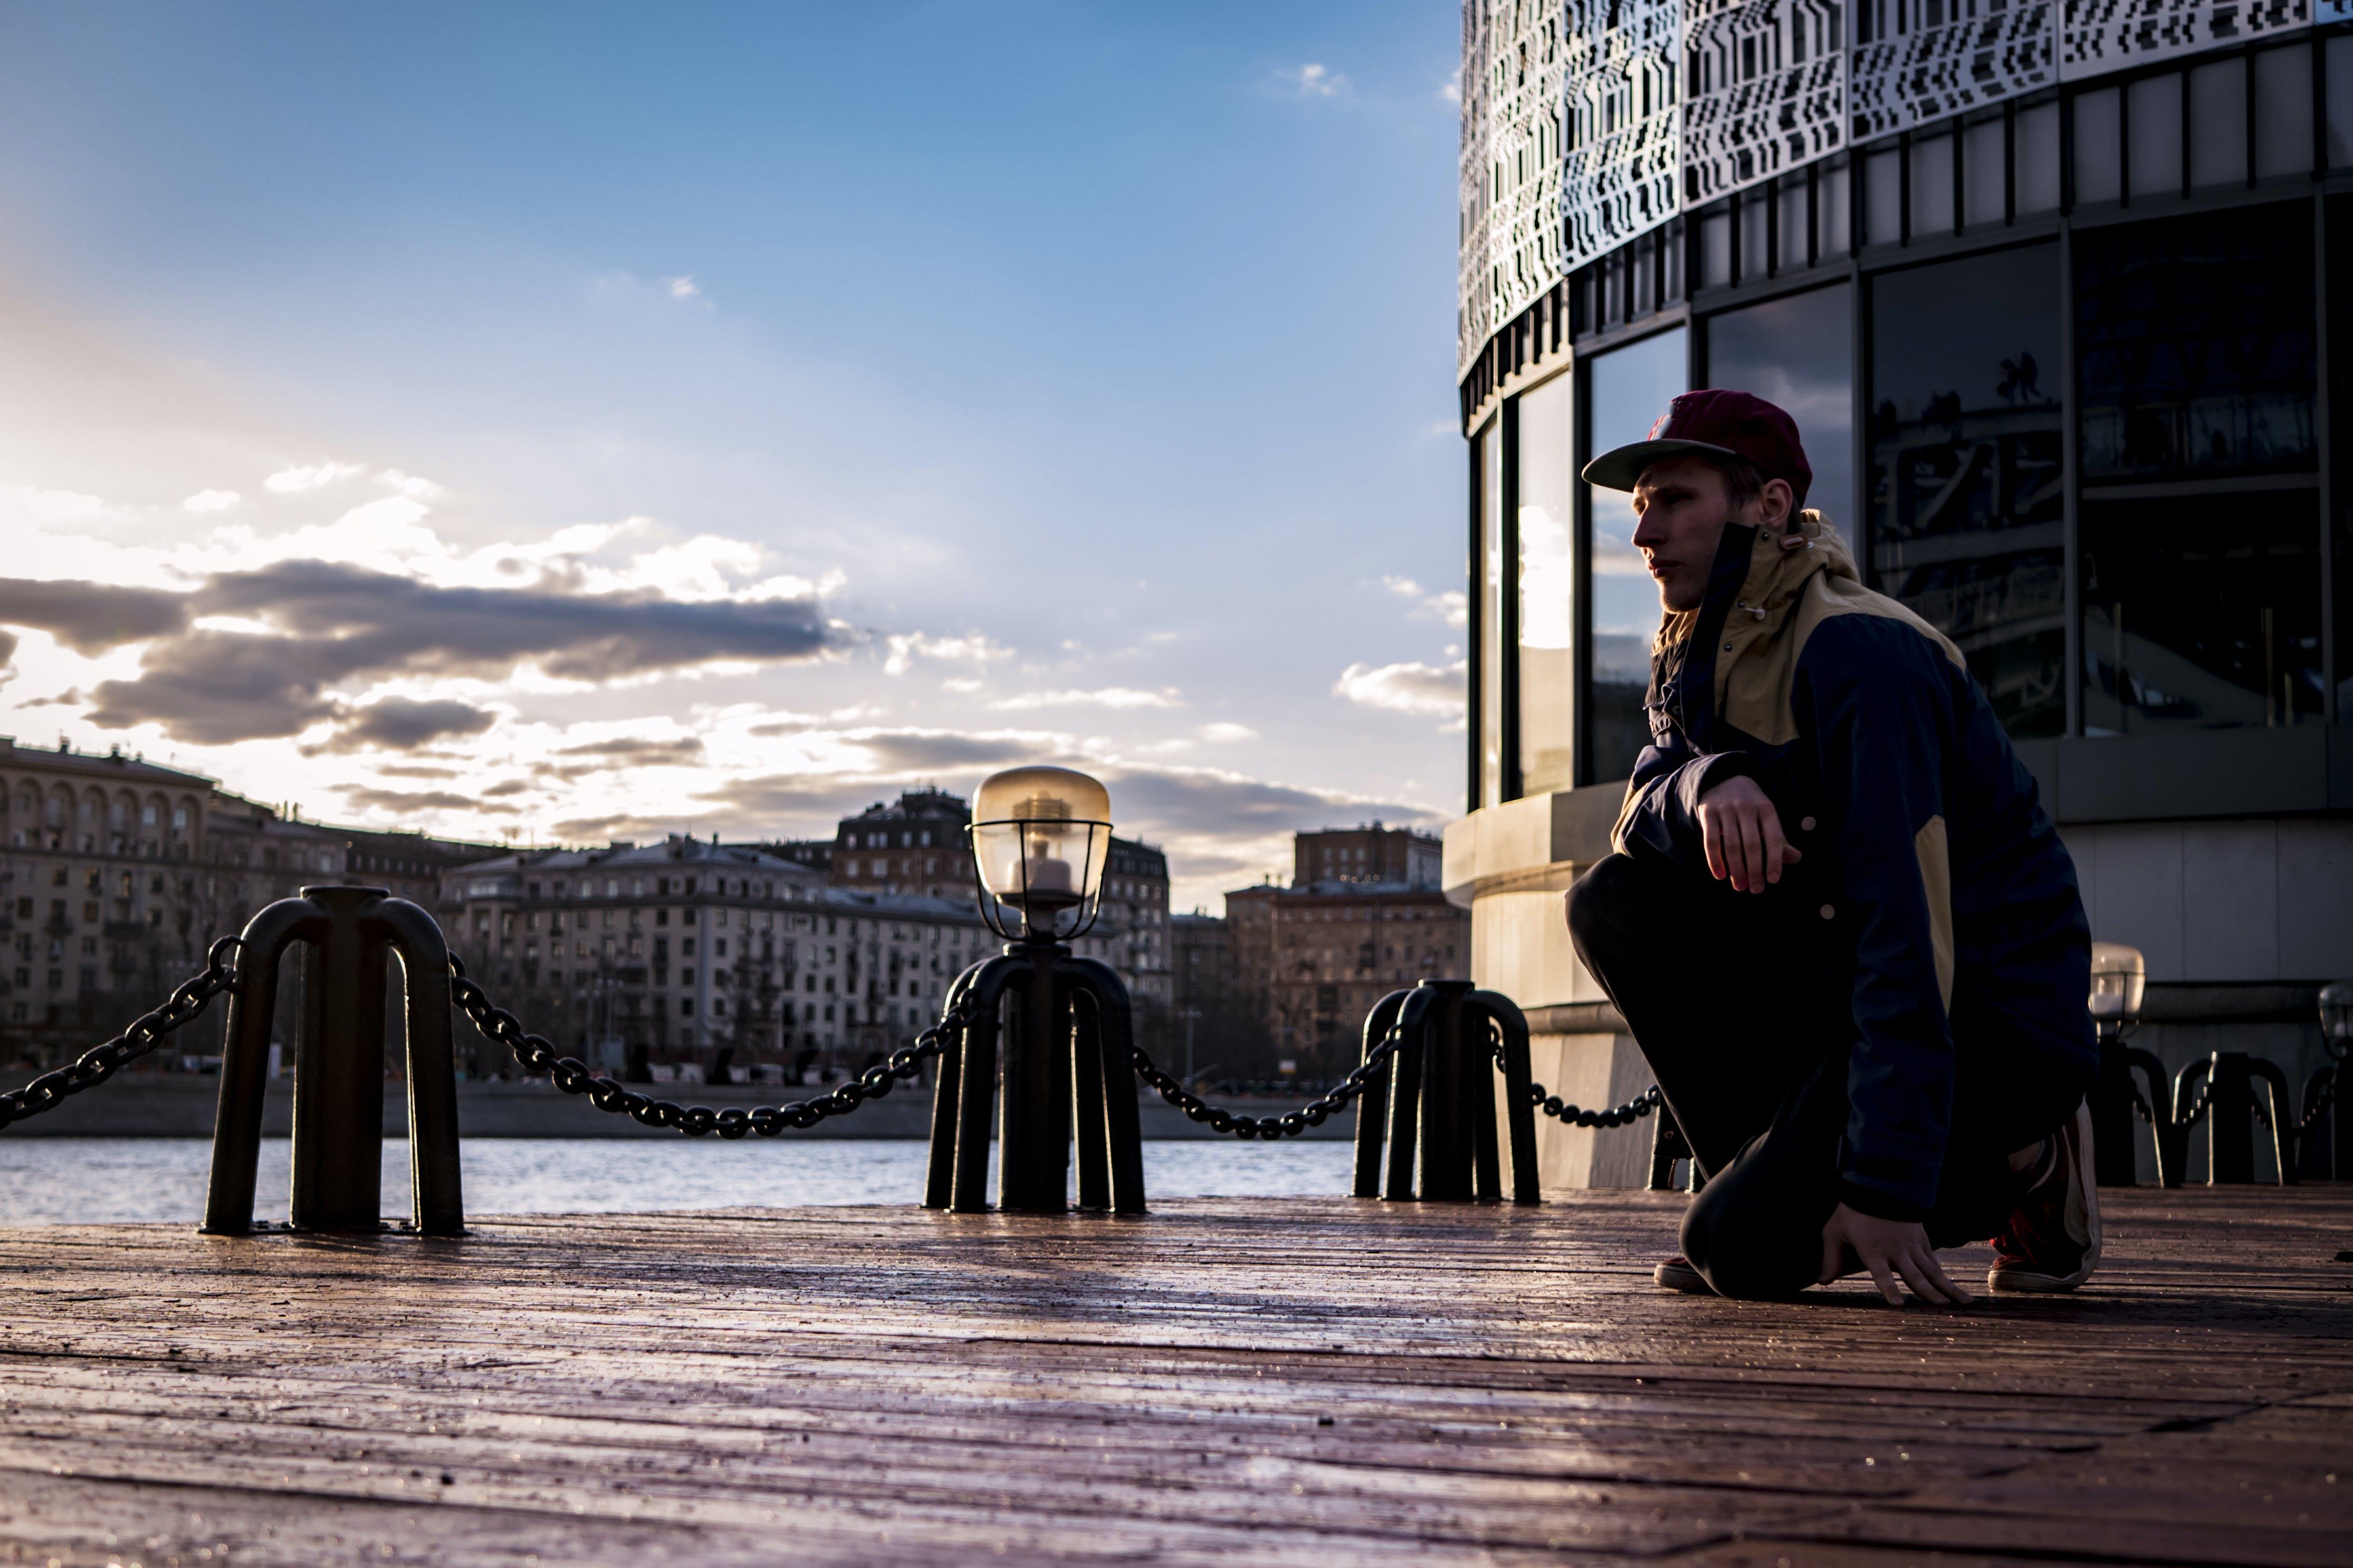 Man Kneeling in Front of Glass Building